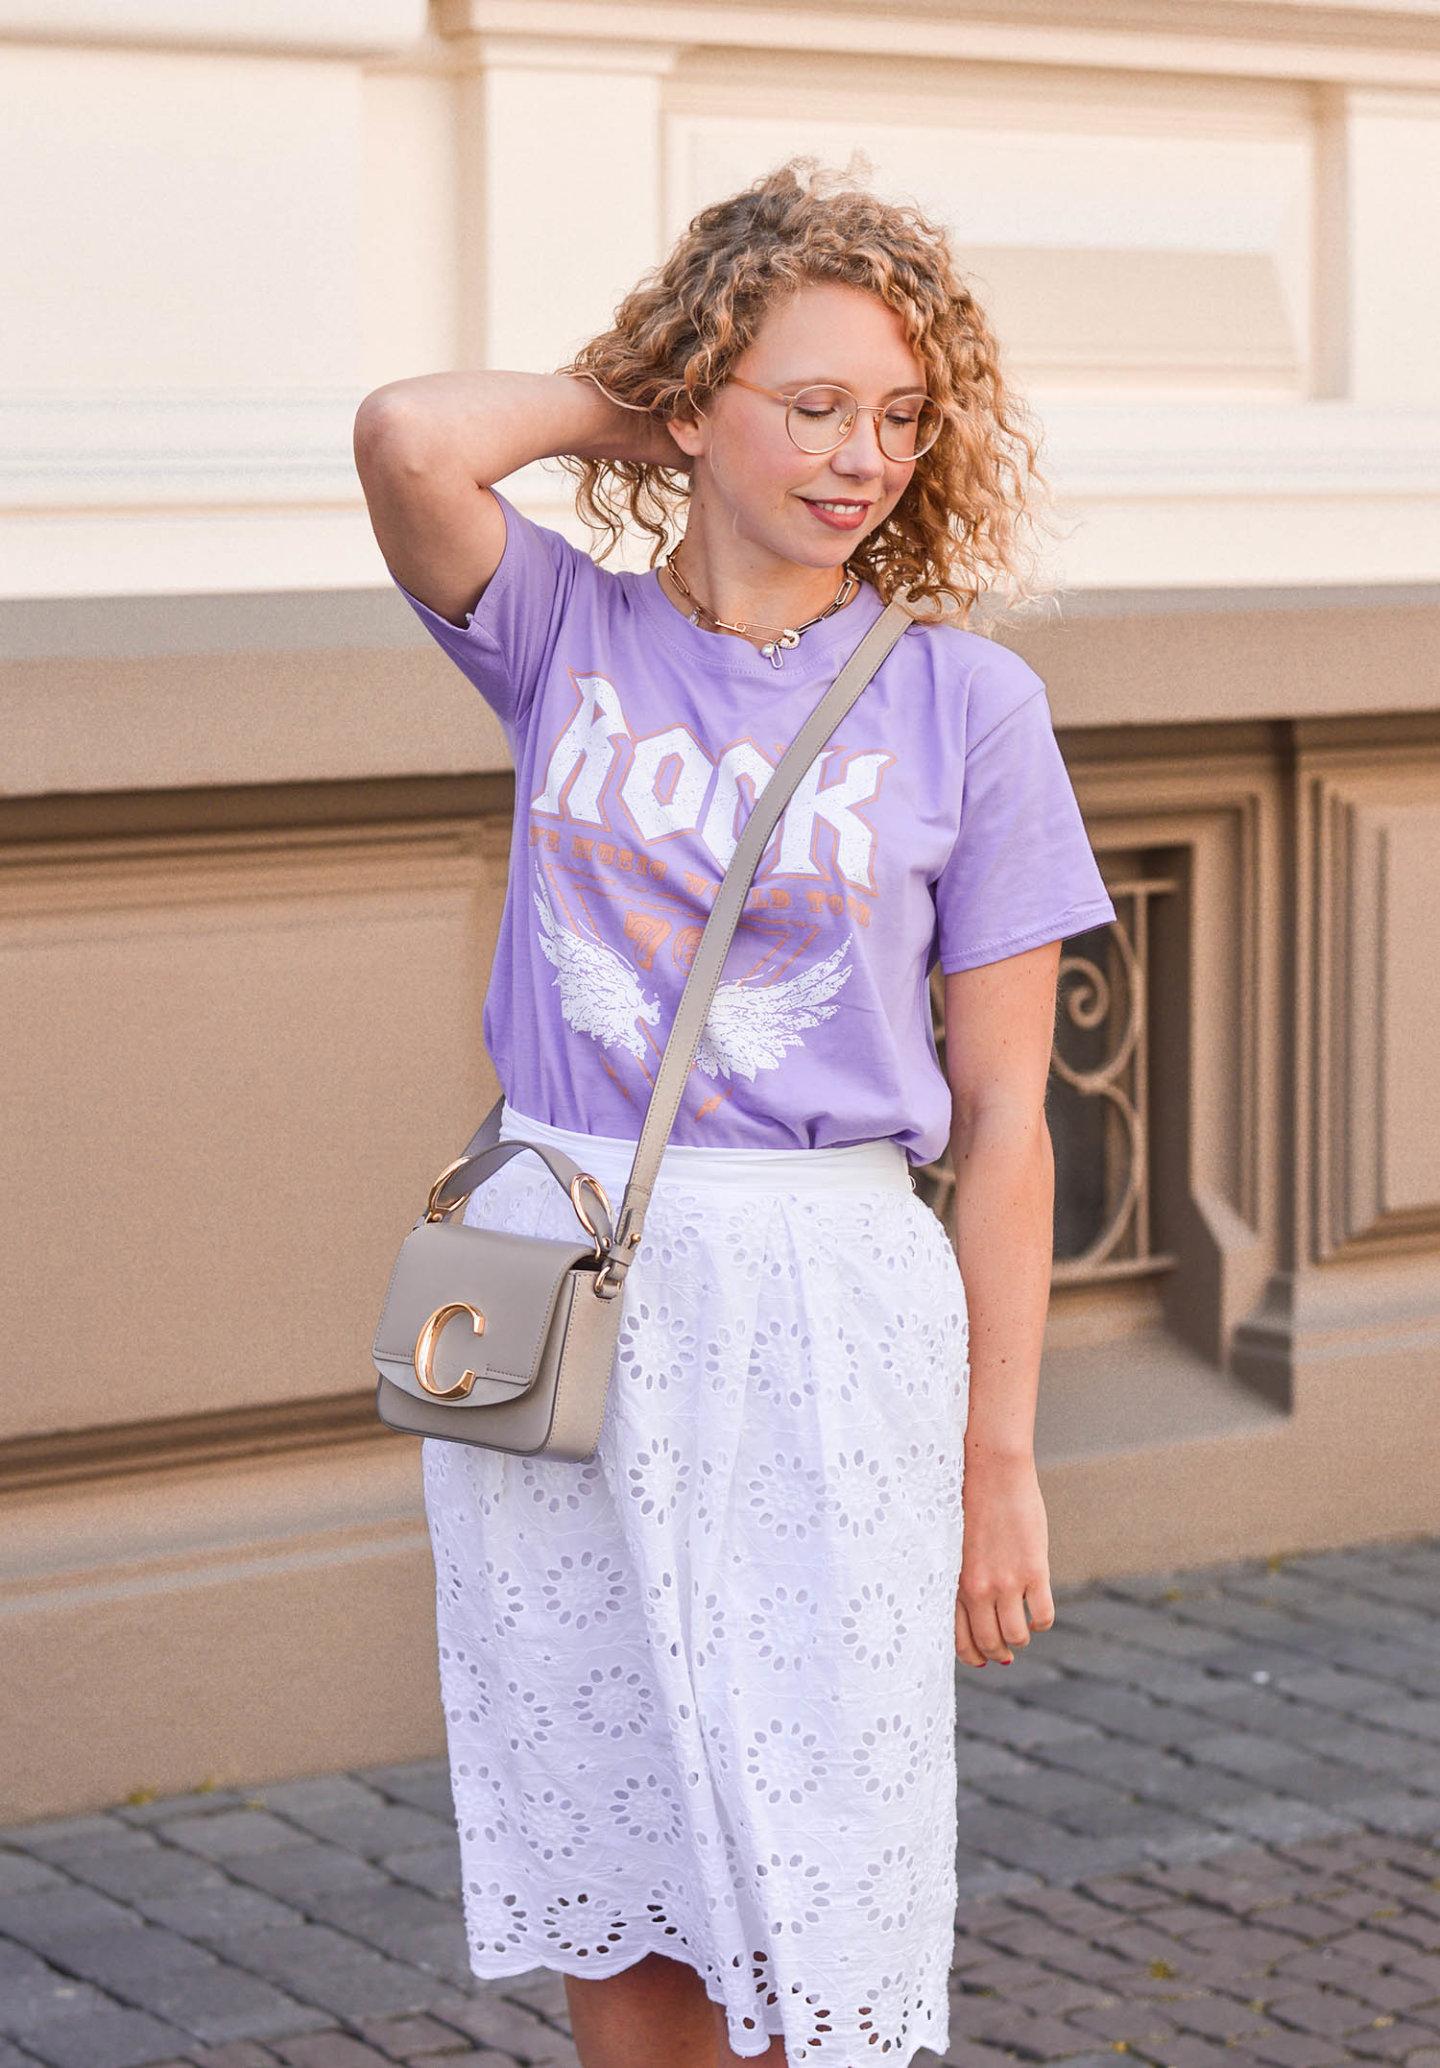 Trendfarbe lila diesen Sommer kombinieren